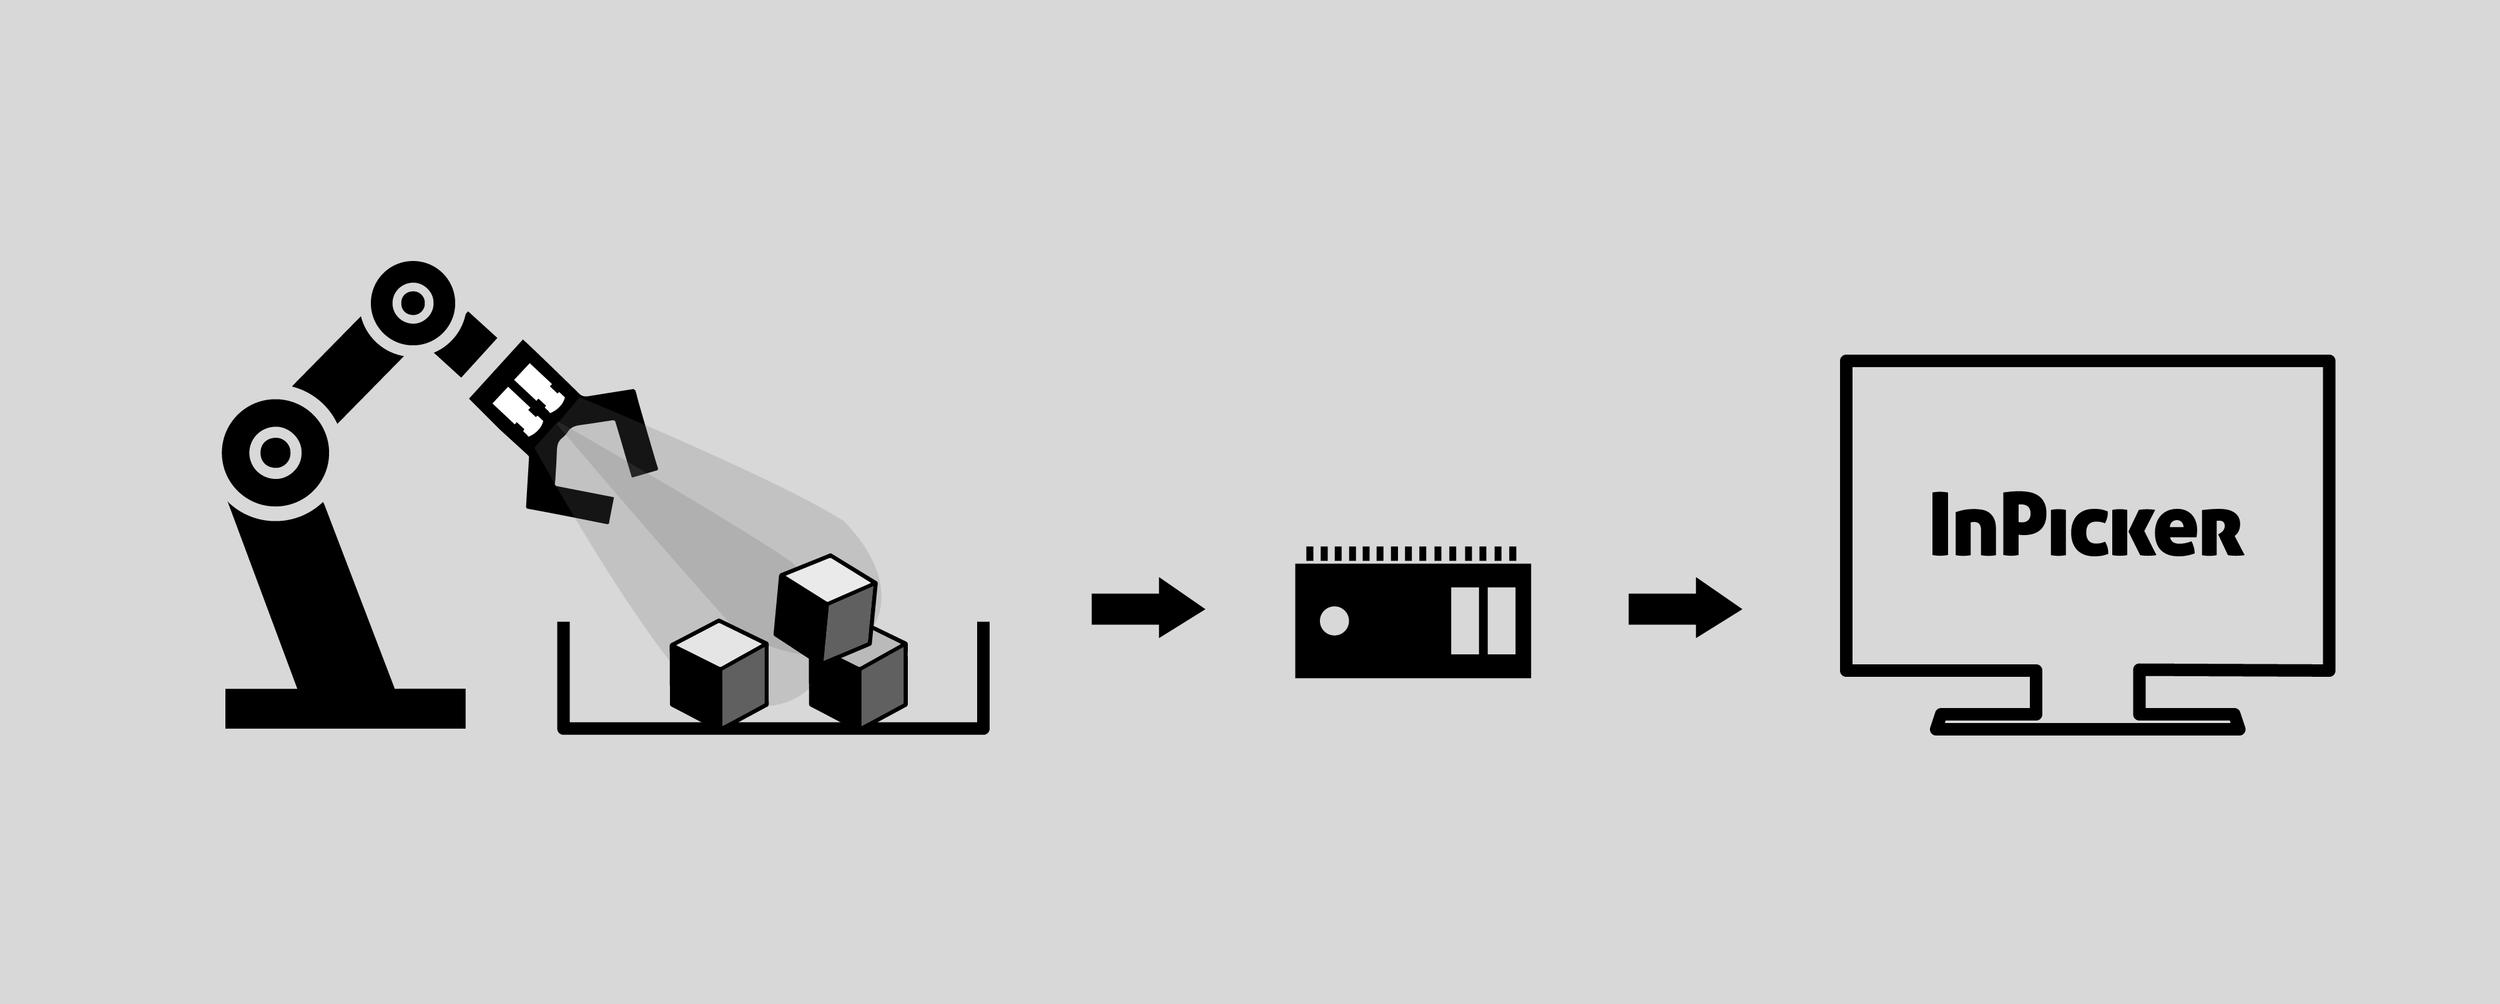 inpicker-components